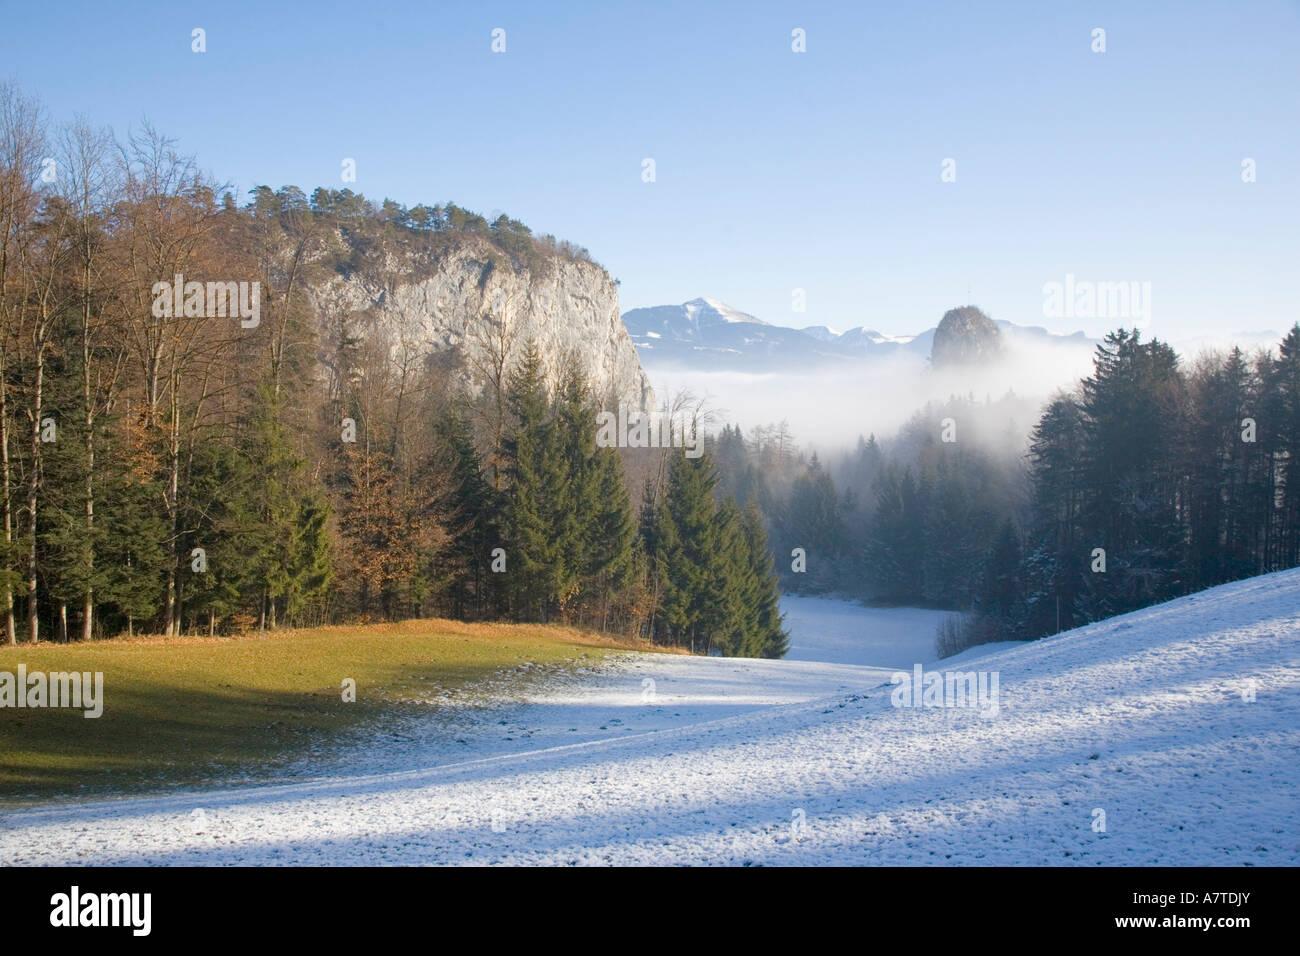 Fog over forest, Bavaria, Germany - Stock Image